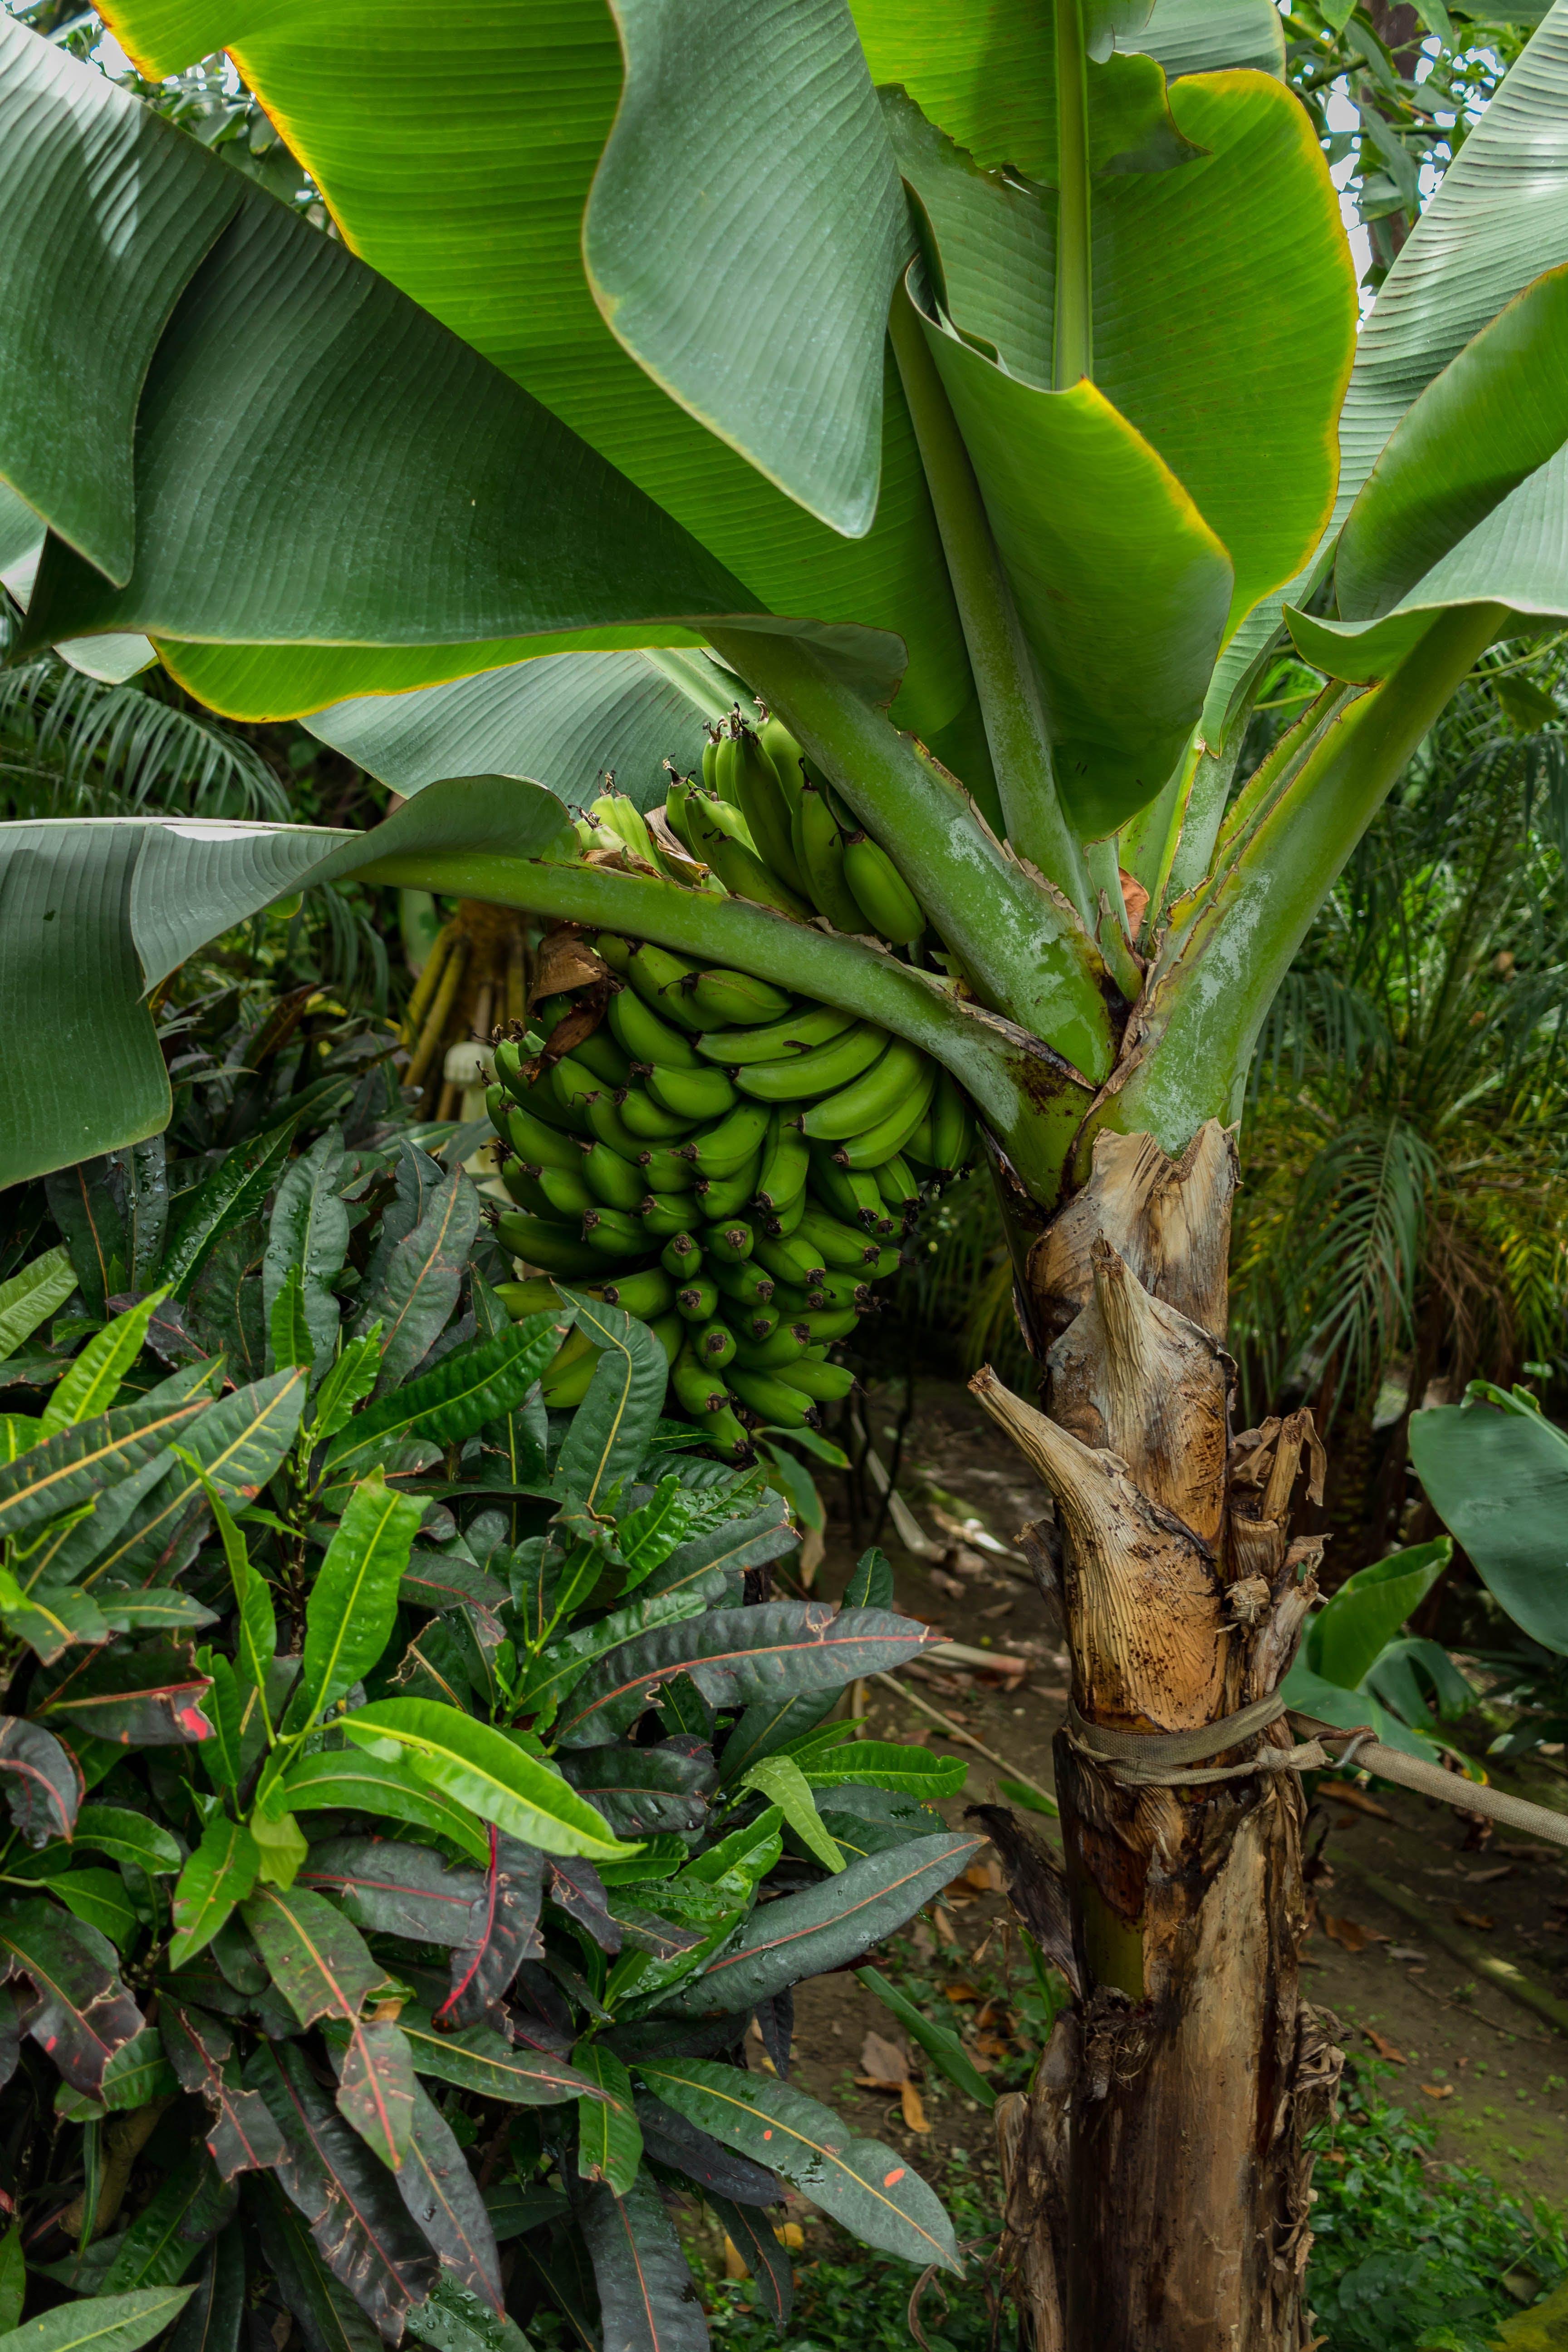 Kostenloses Stock Foto zu ast, bana, banane, bananenbaum